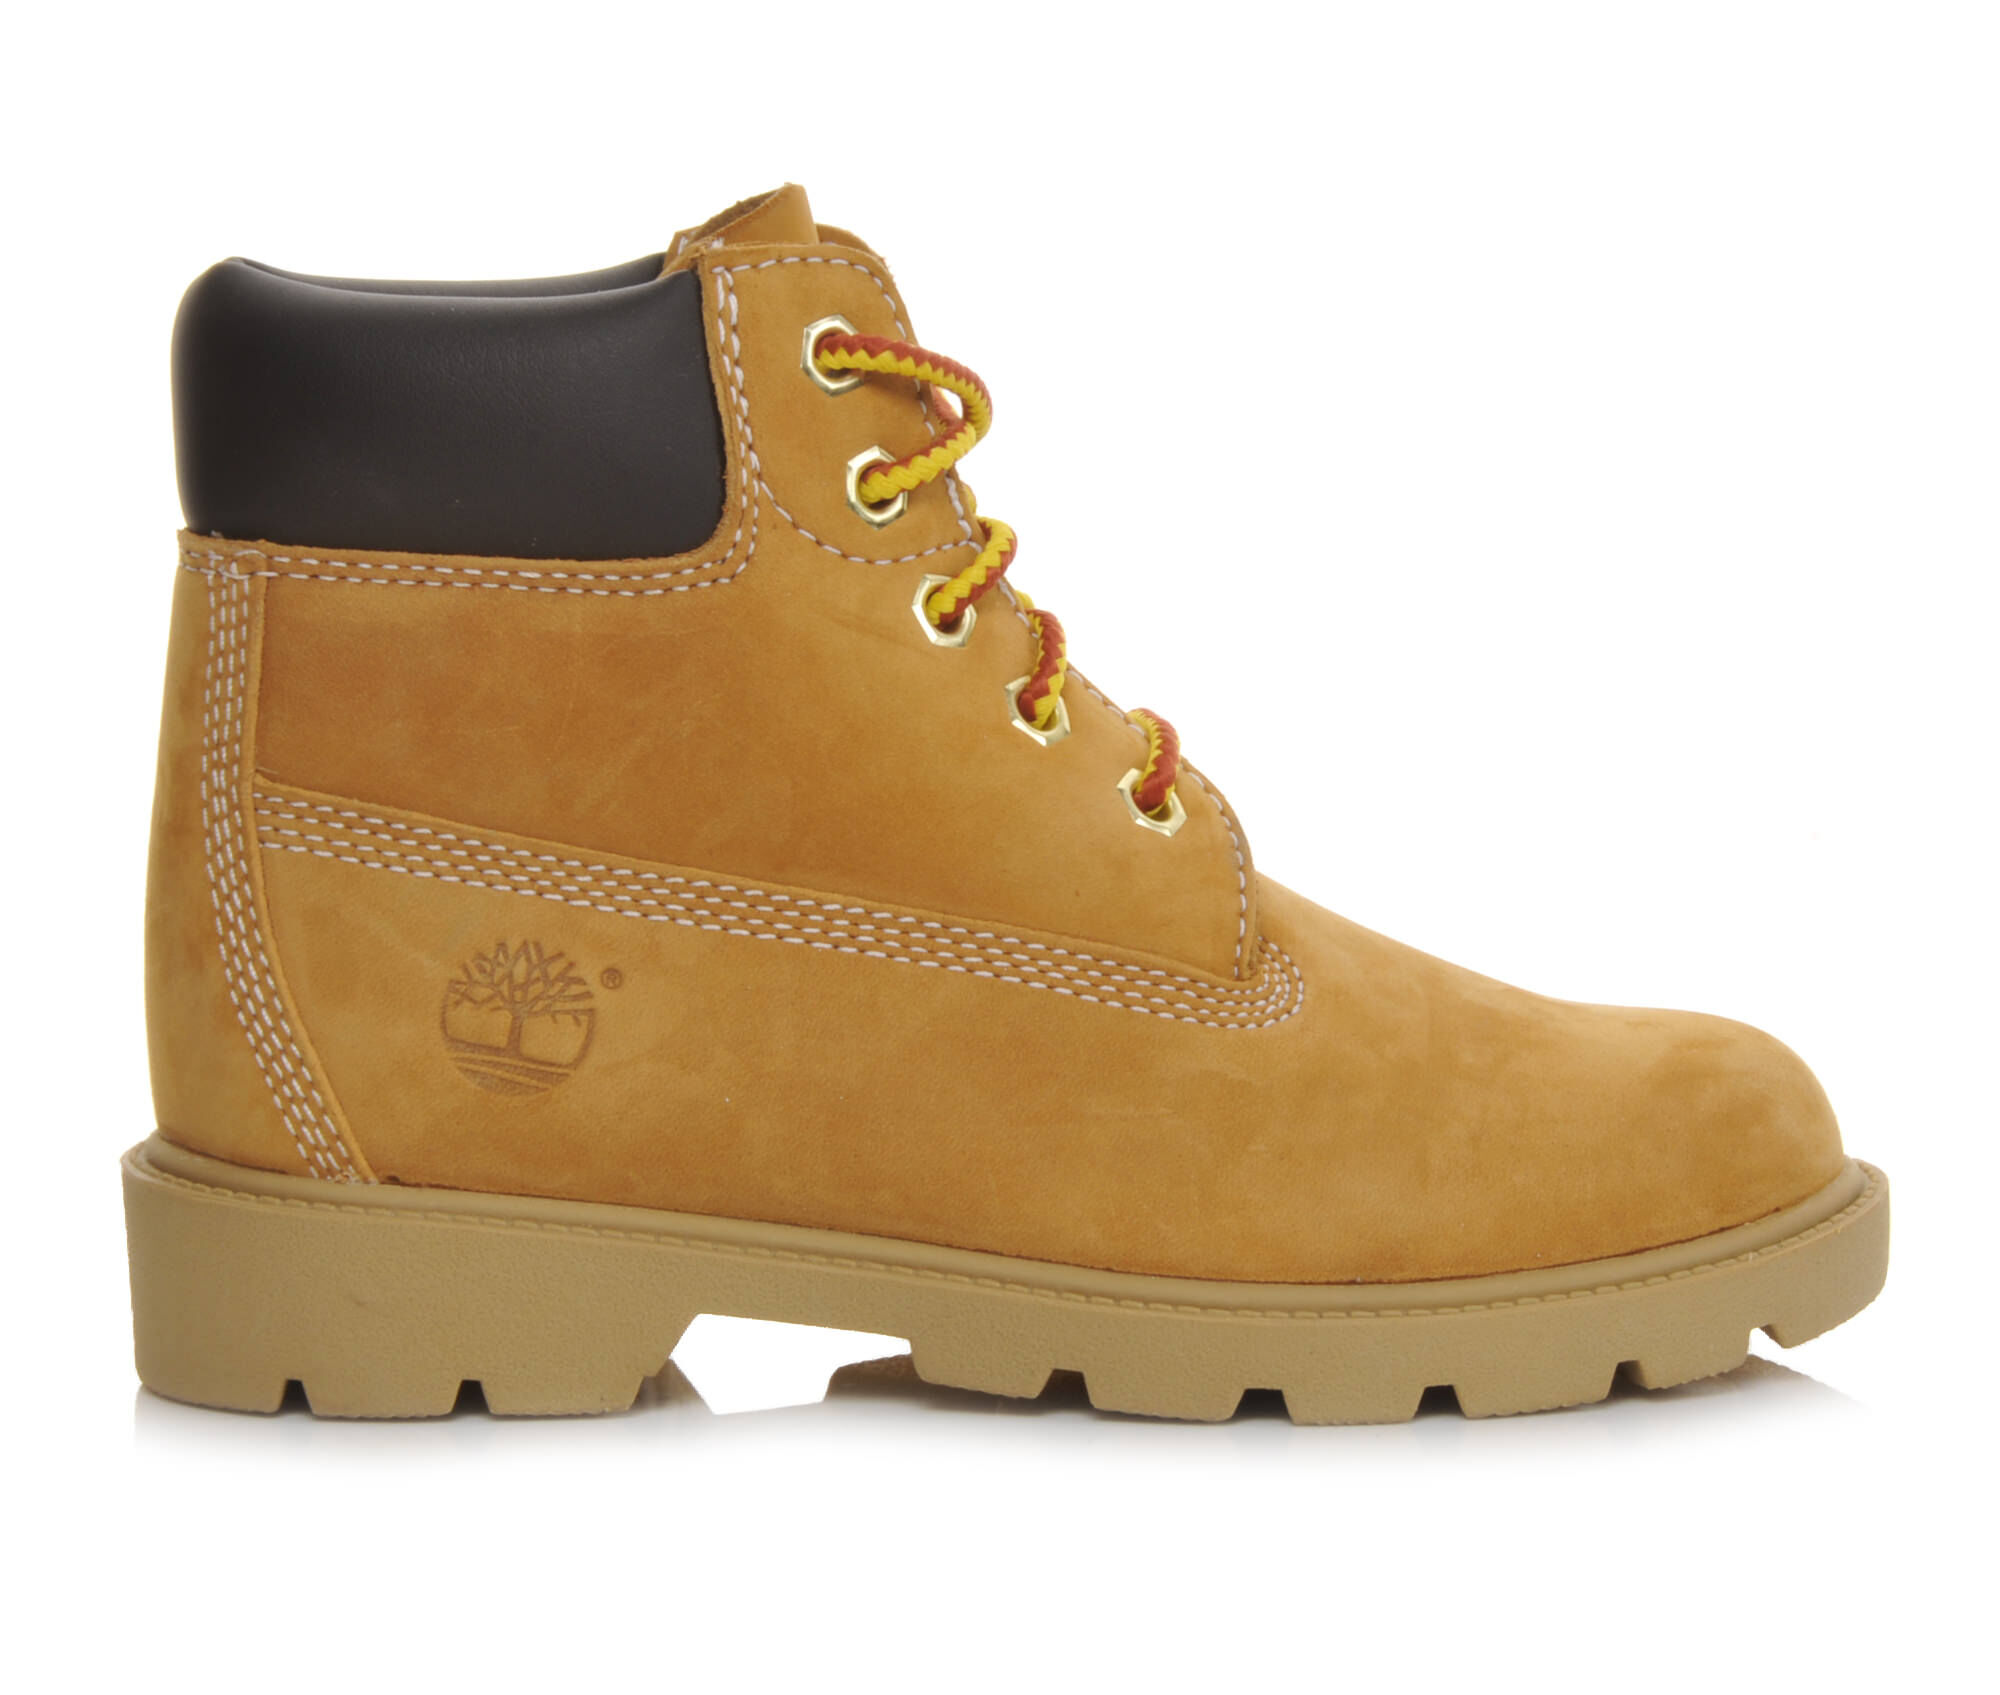 Boys\u0027 Timberland Little Kid 10760 6 Inch Classic Boots